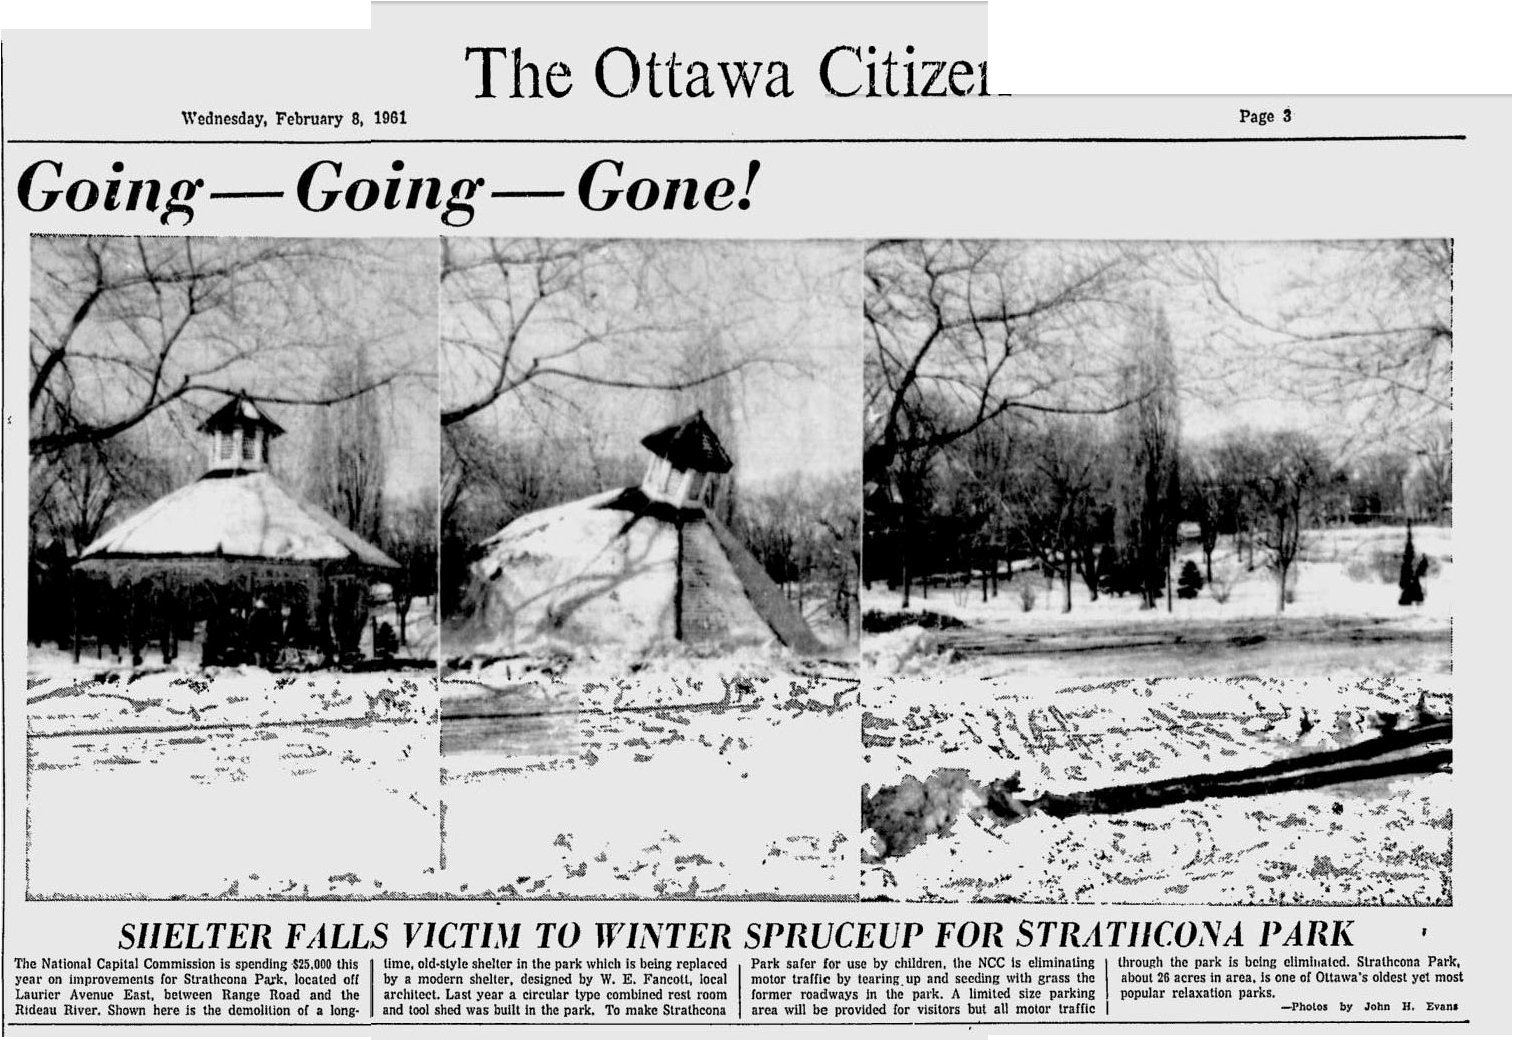 Strathcona Park Gazebo torn down in 1961, Ottawa, Canada